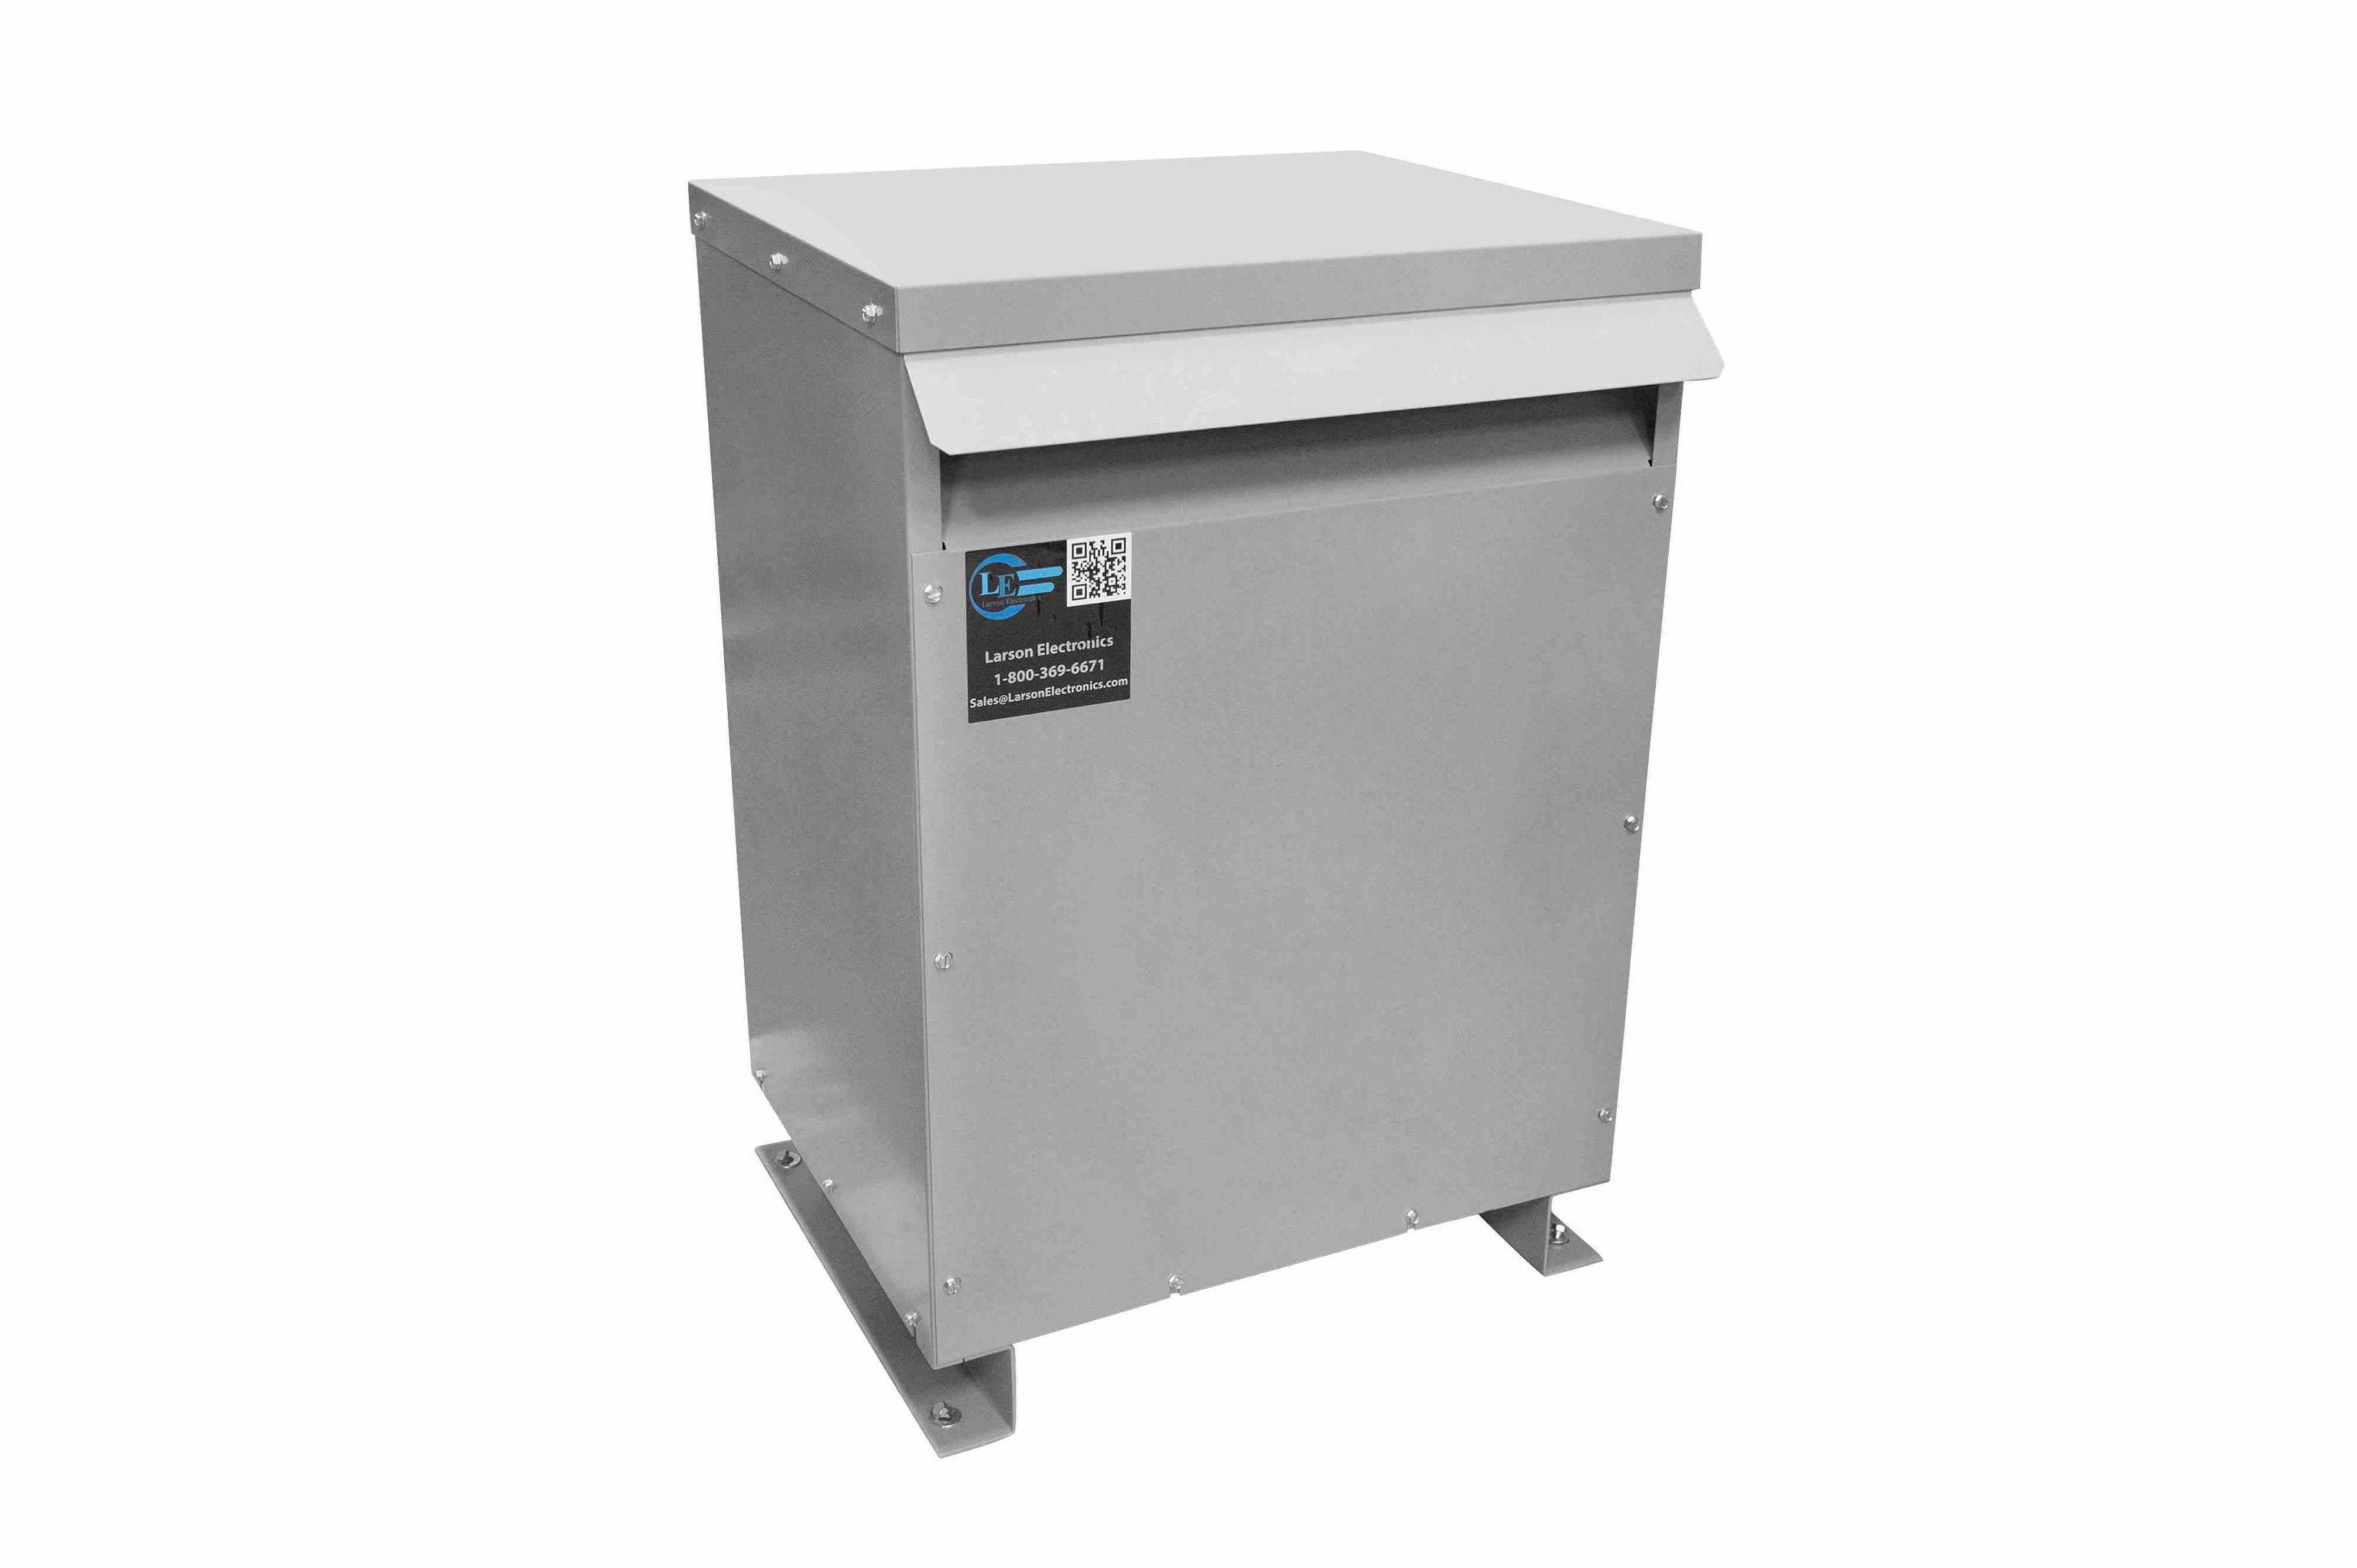 25 kVA 1PH DOE Efficiency Transformer, 240V Primary, 240V Secondary, NEMA 3R, Ventilated, 50 Hz